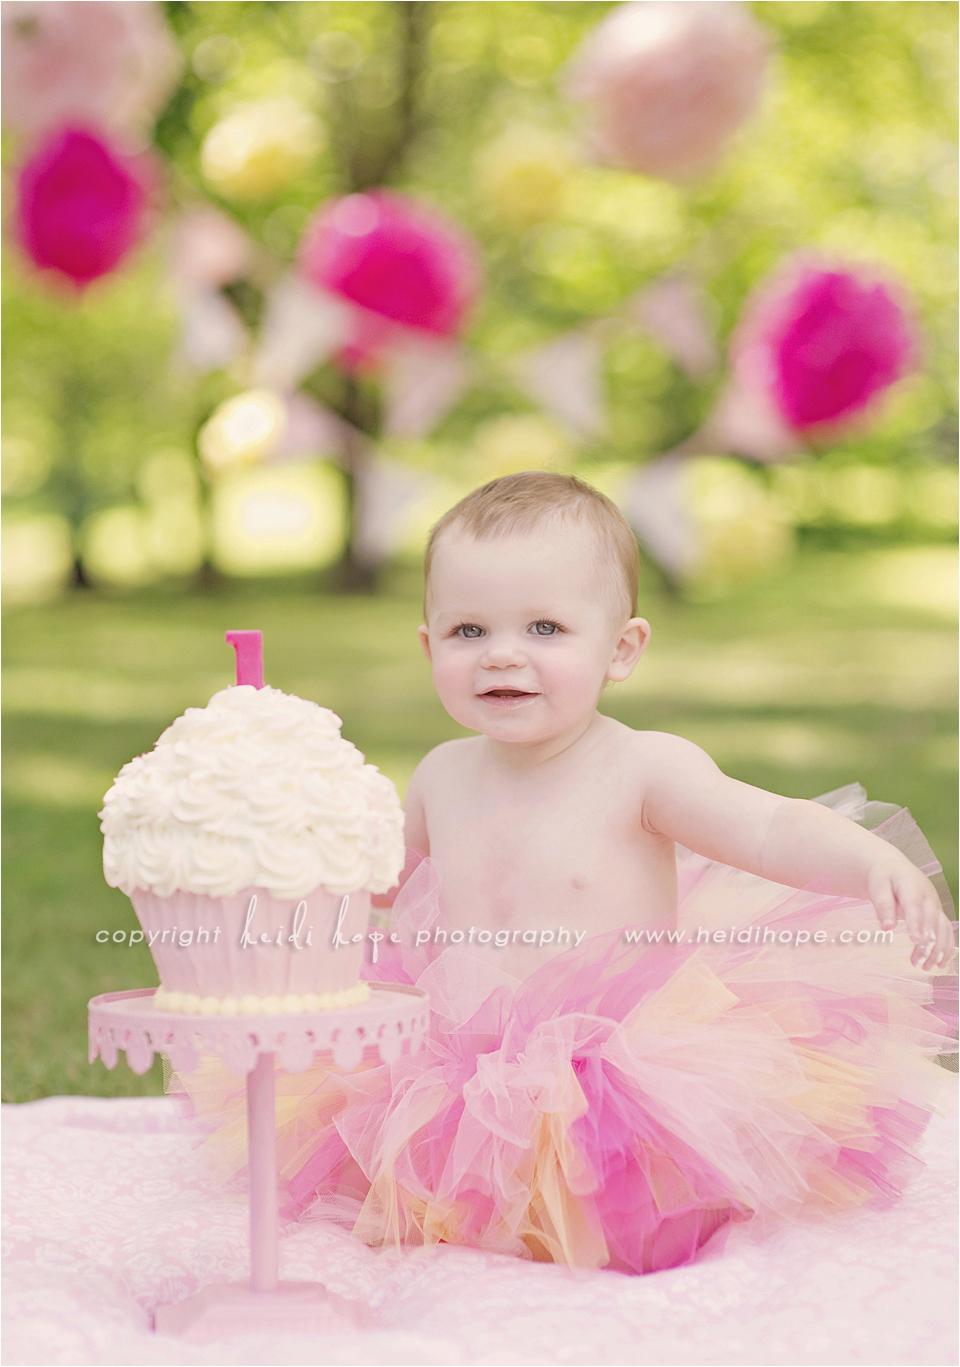 Cake Smash Ideas for 1st Birthday Girl Baby K Turns 1 Year Old Rhode island First Birthday Cake